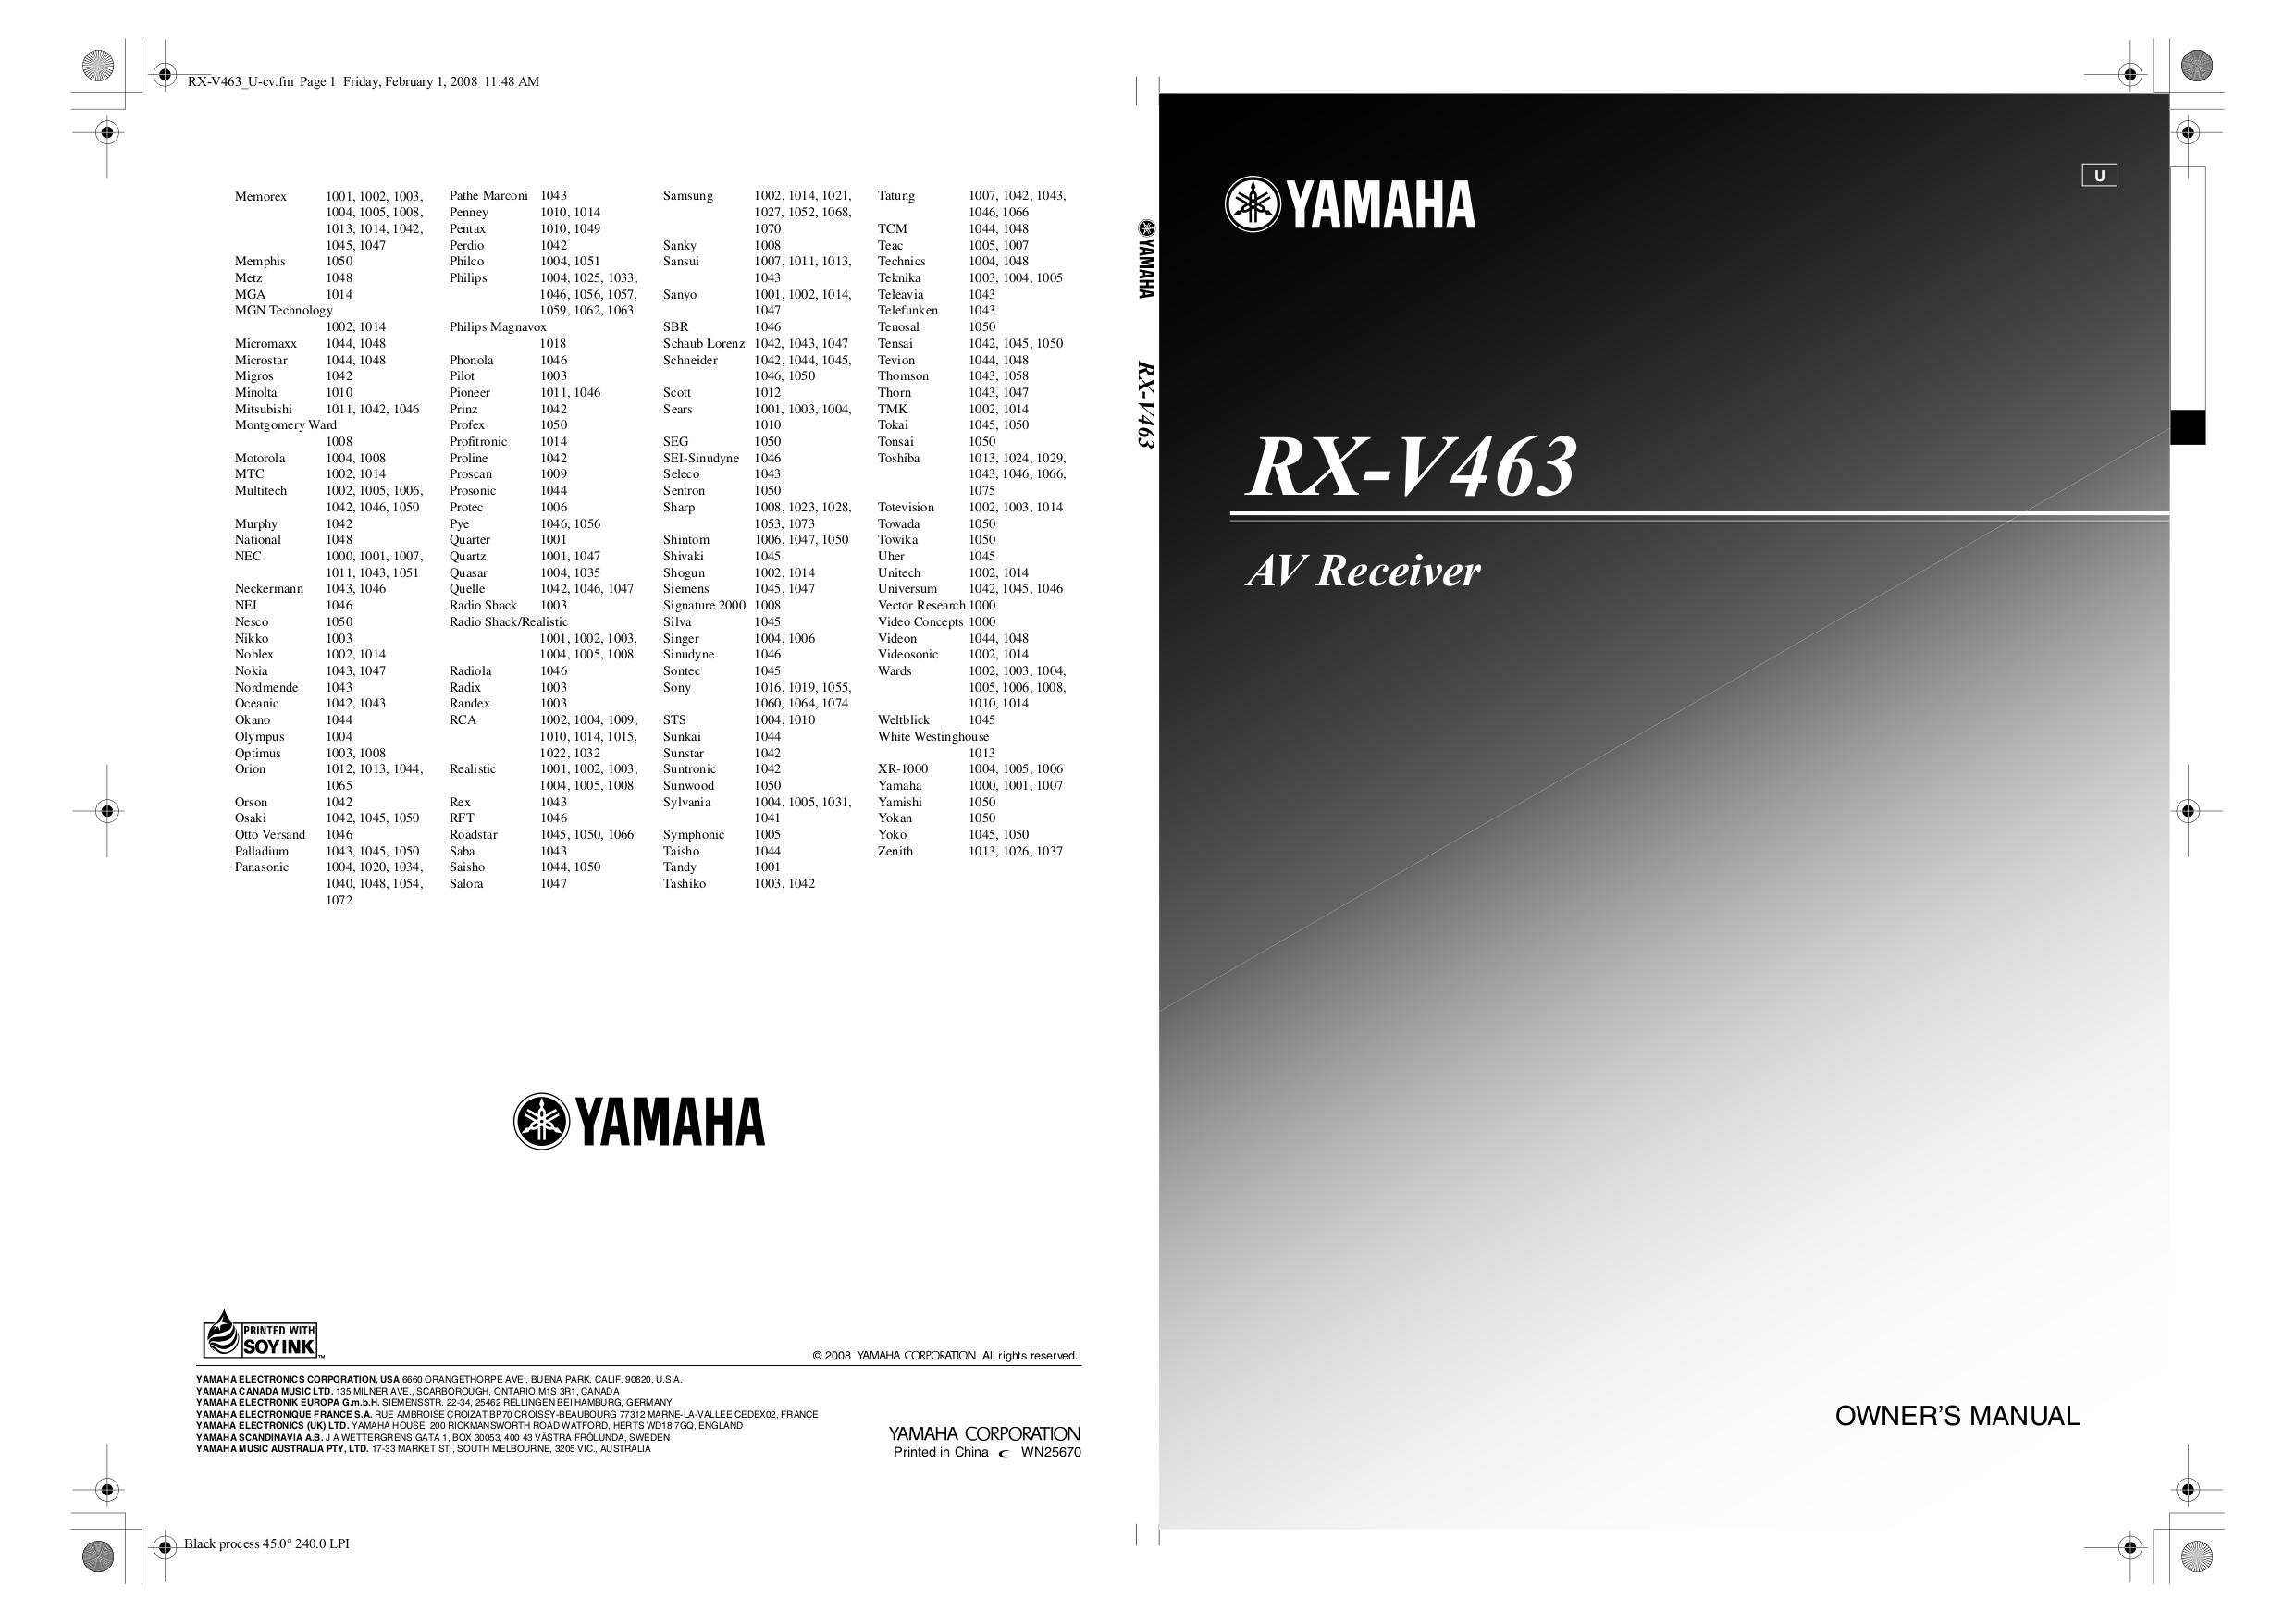 yamaha rxv673 manual